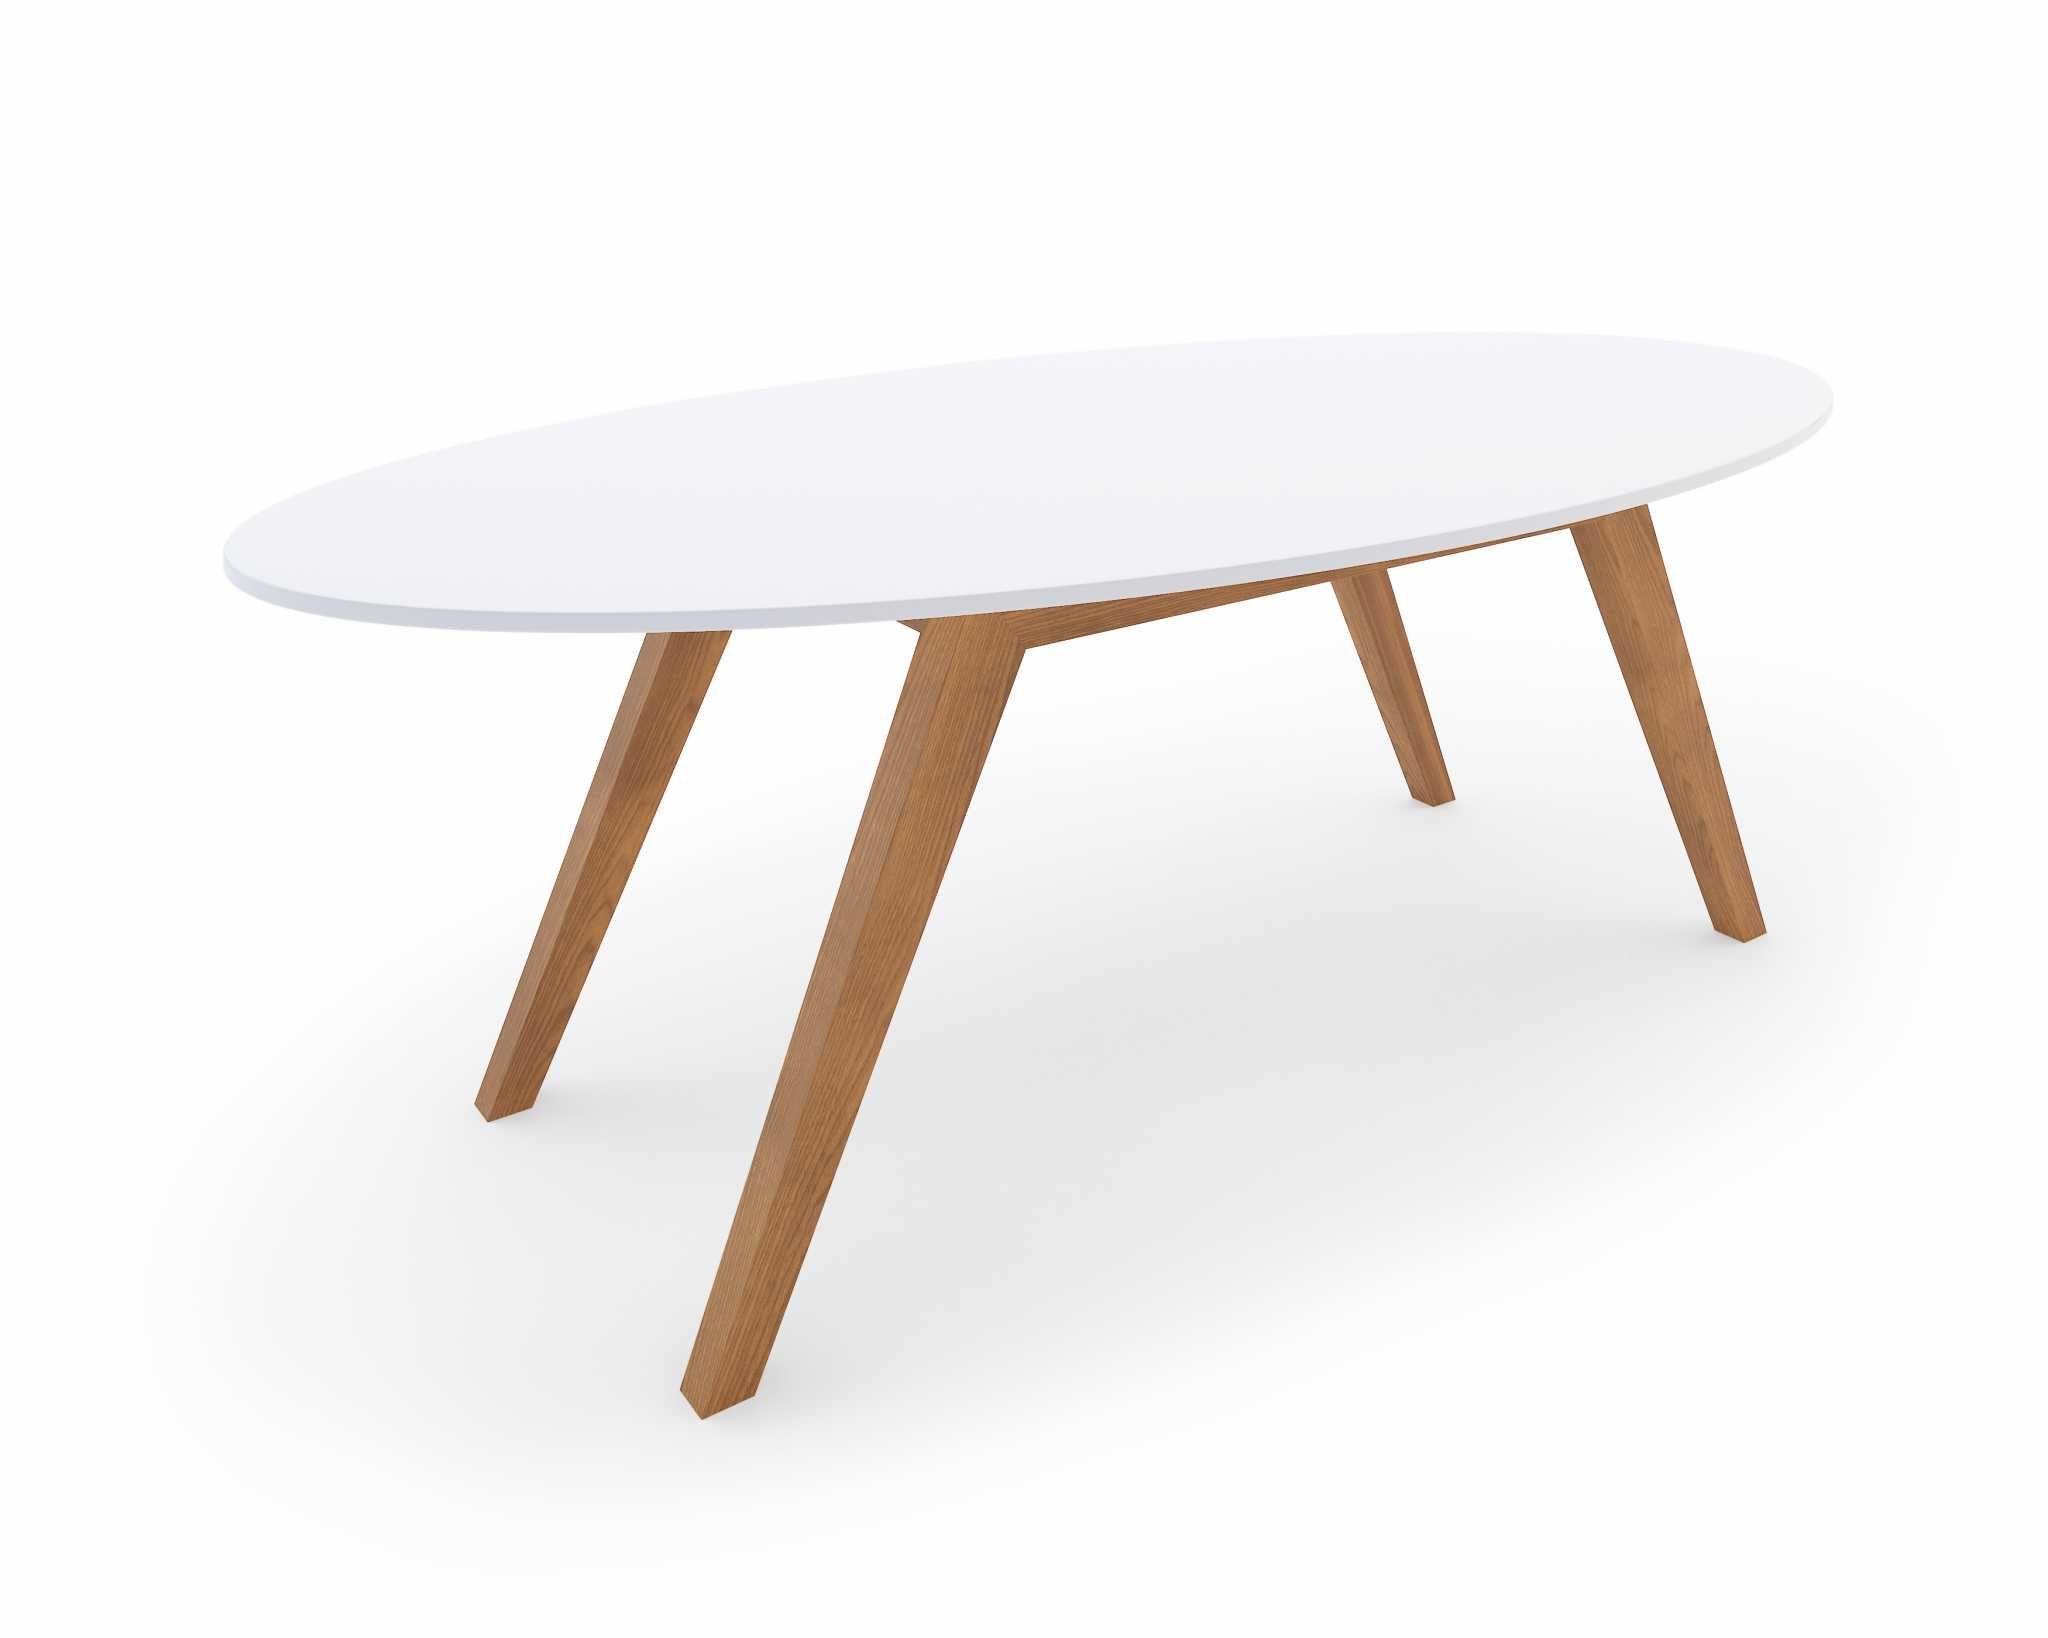 14 Delightful Bedroom Paintings Benjamin Moore Ideas Coffee Table Mid Century Coffee Table Oval Coffee Tables [ 1638 x 2048 Pixel ]